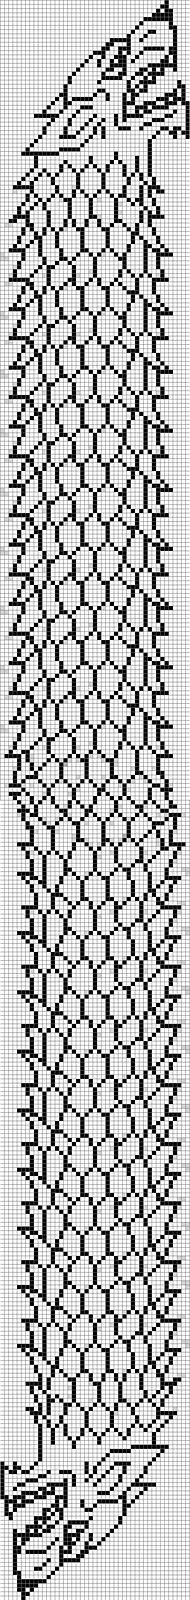 Double-Knitted House Stark Direwolf Scarf pattern by Katie Dawson